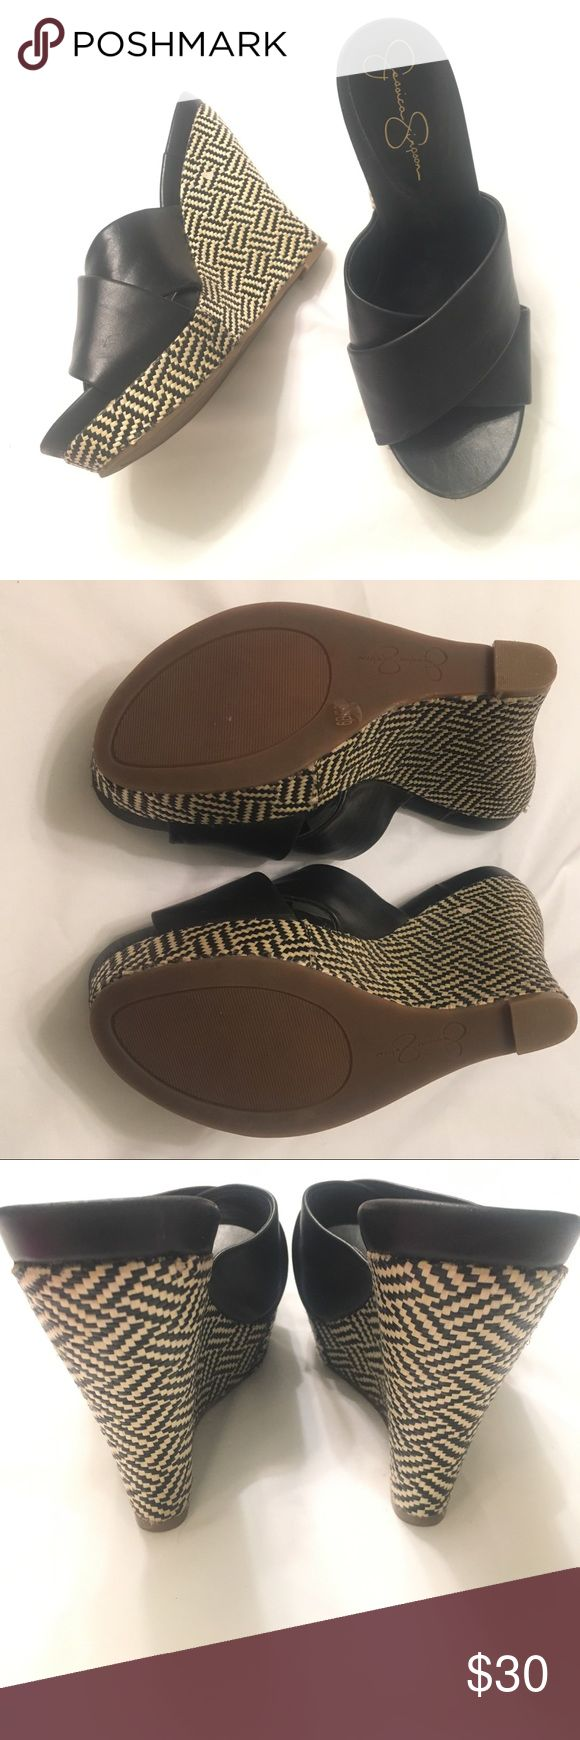 Jessica Simpson wedges sz 6 NWOT Jessica Simpson wedges sz 6 Jessica Simpson Shoes Wedges